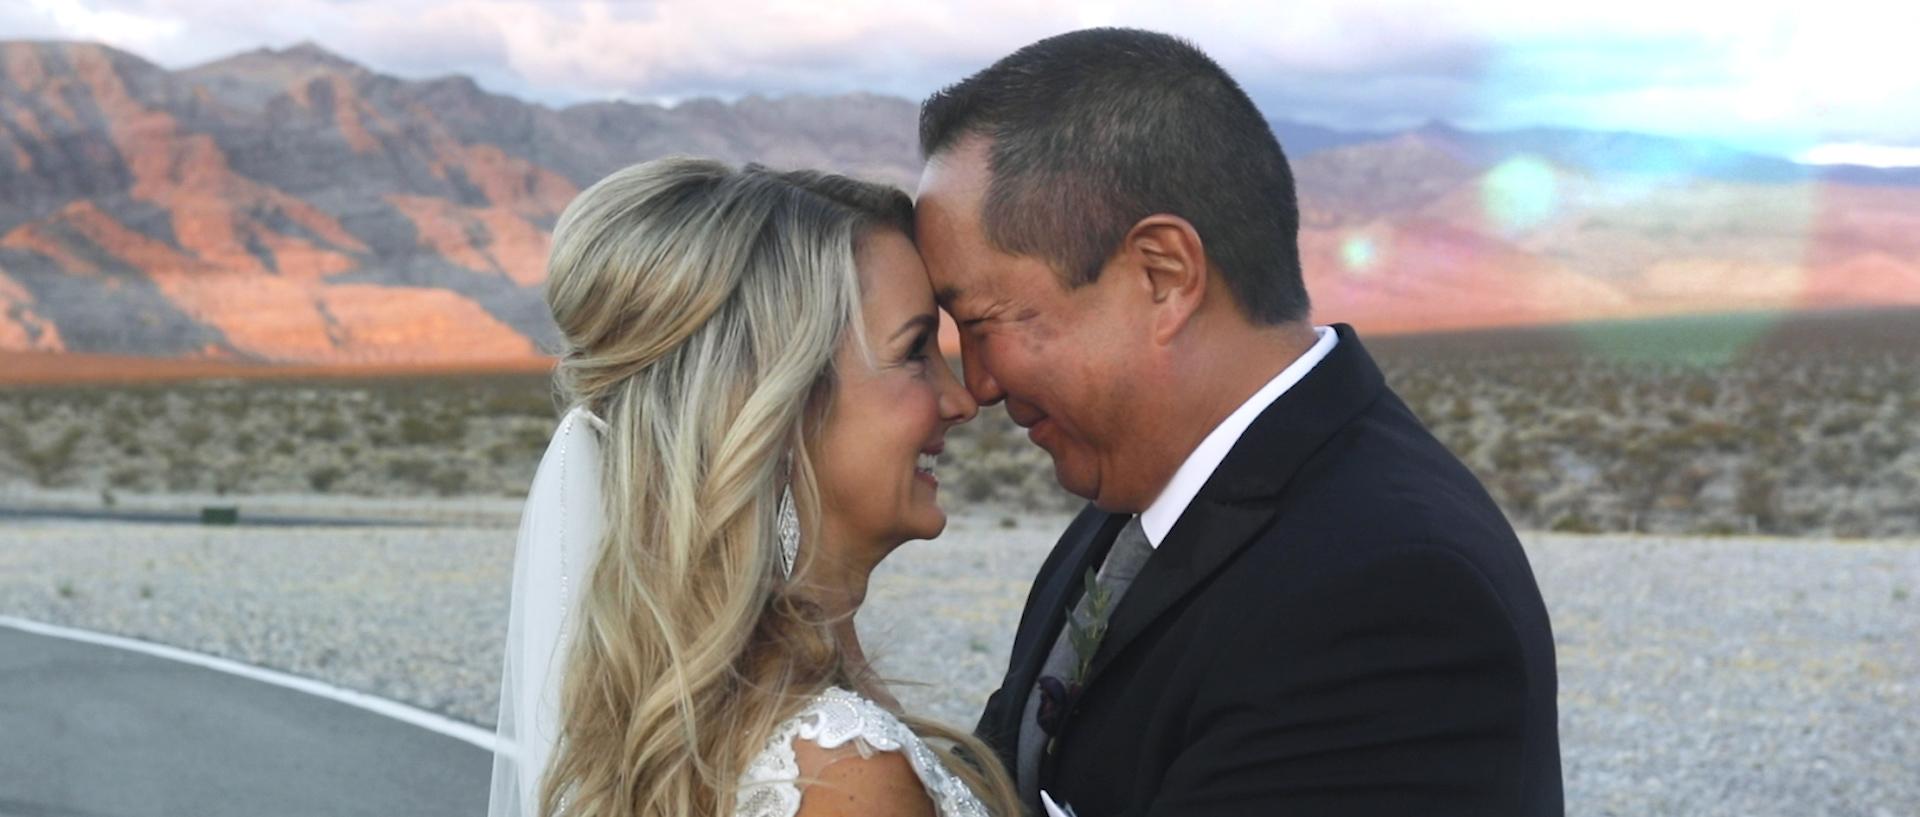 Jessica and Jeffrey Wedding Story.06_36_10_03.Still014.jpg